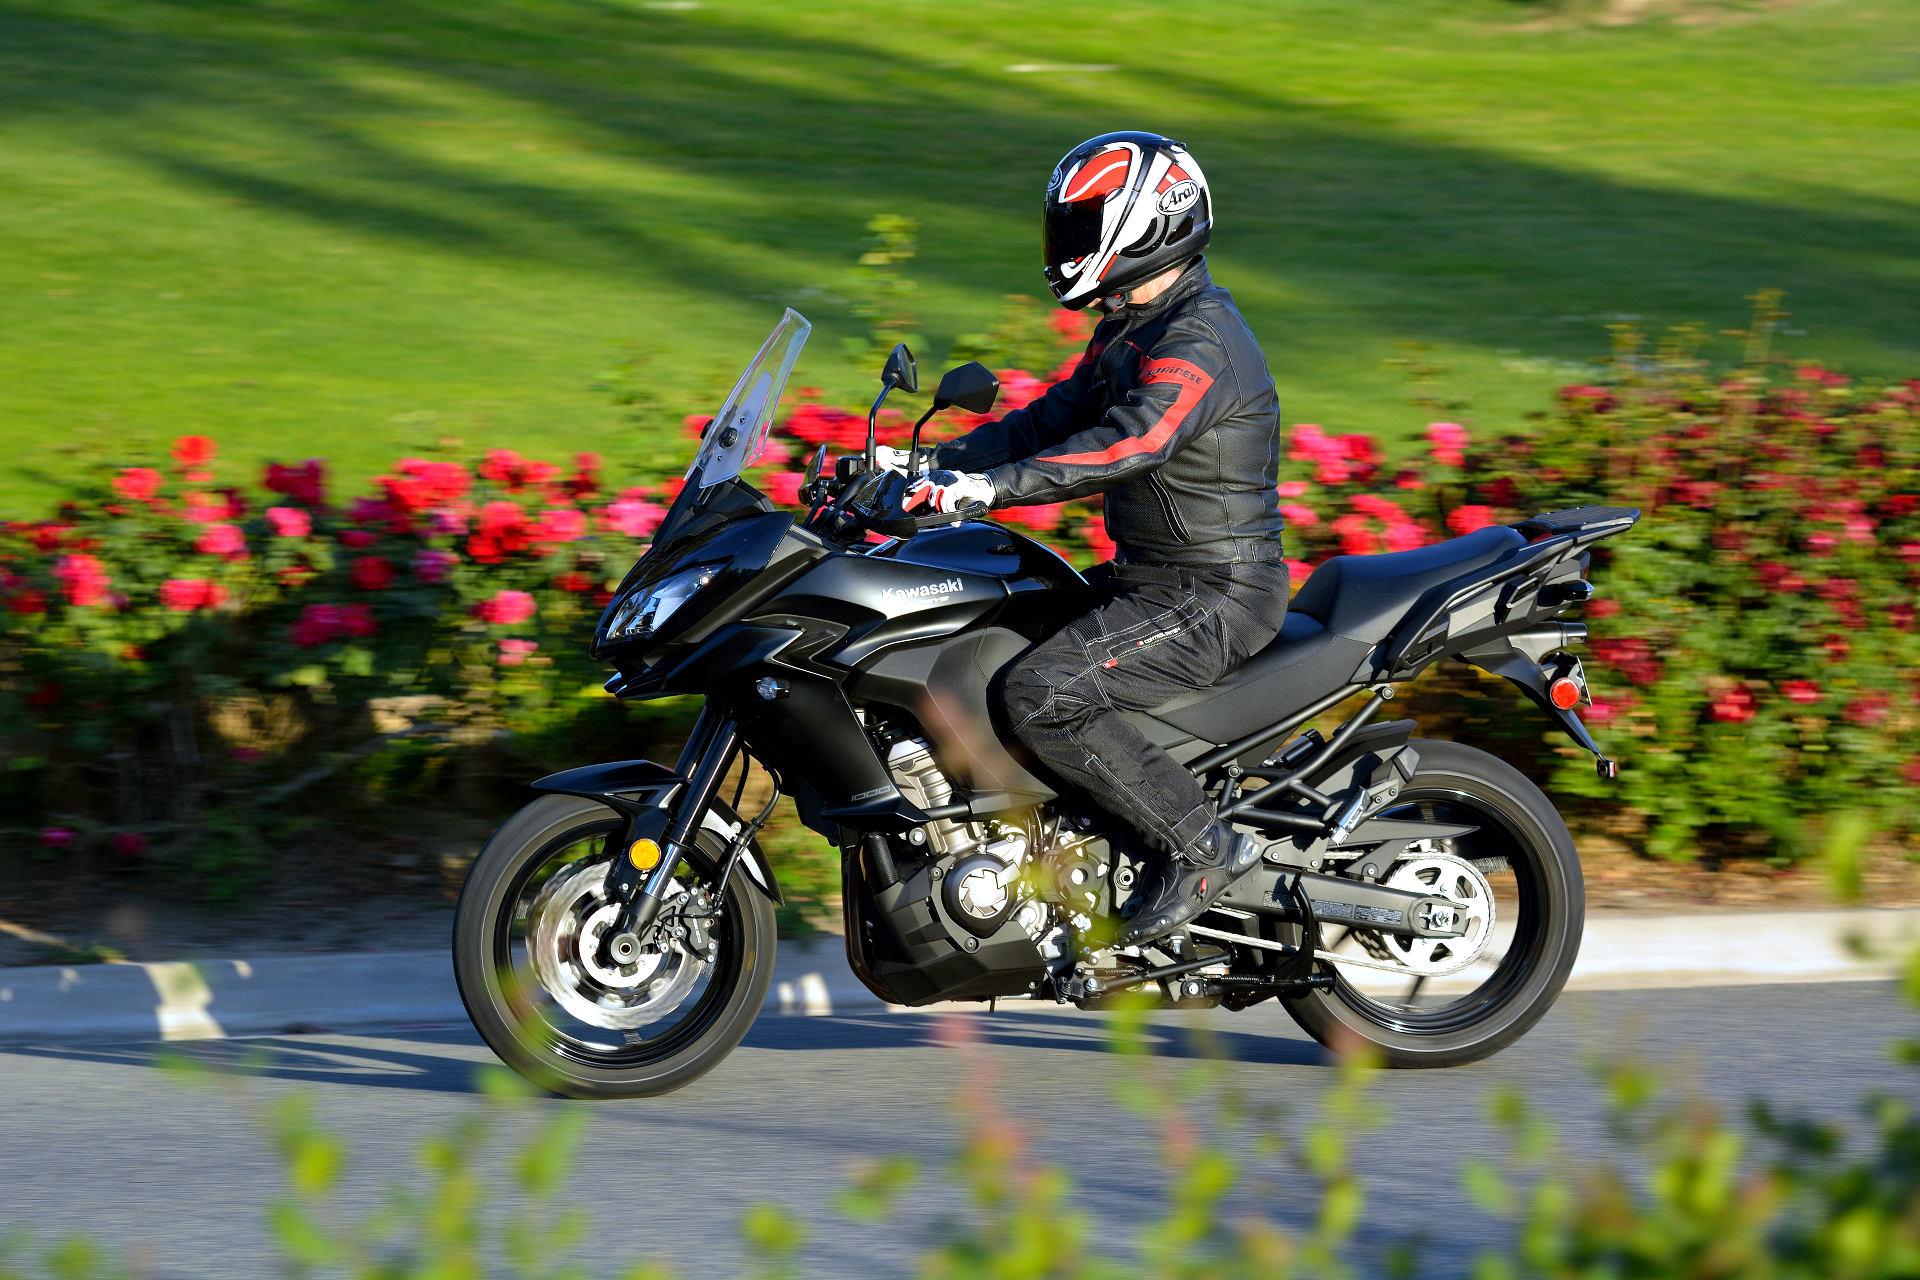 2015 Kawasaki Versys 1000 Lt Md Ride Review Motorcycledailycom